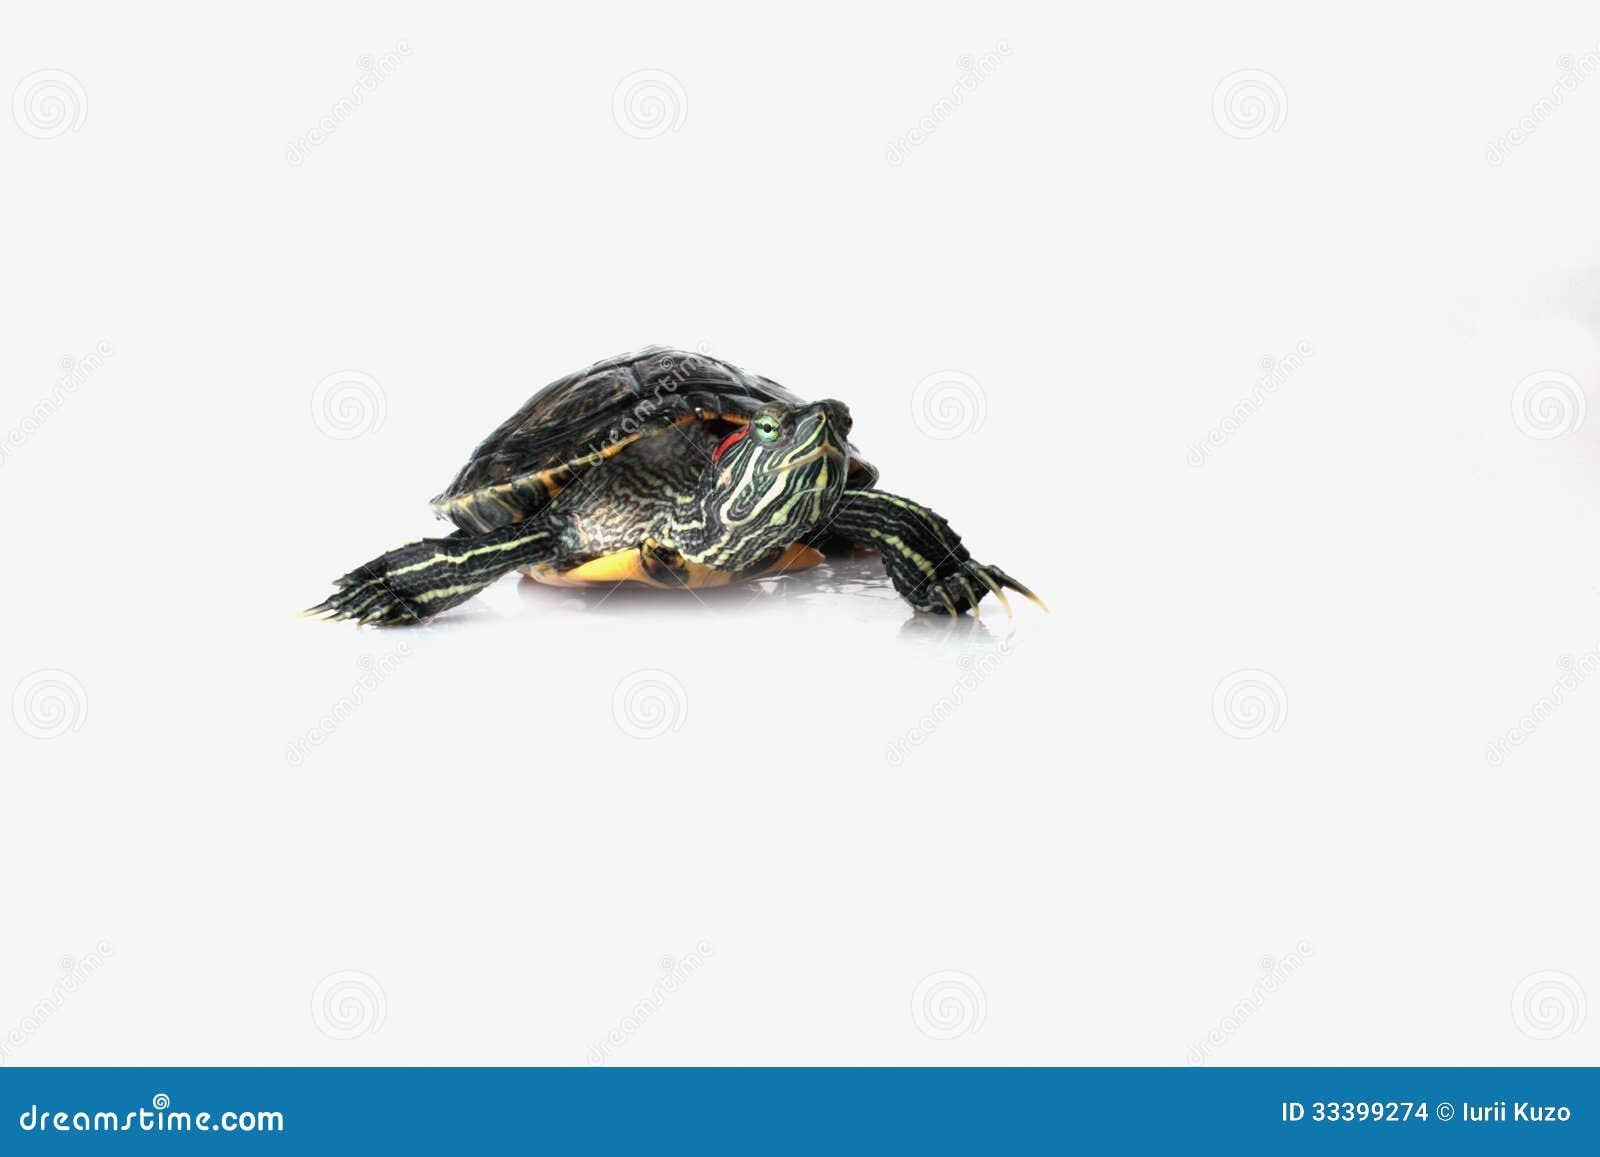 turtle white background - photo #41